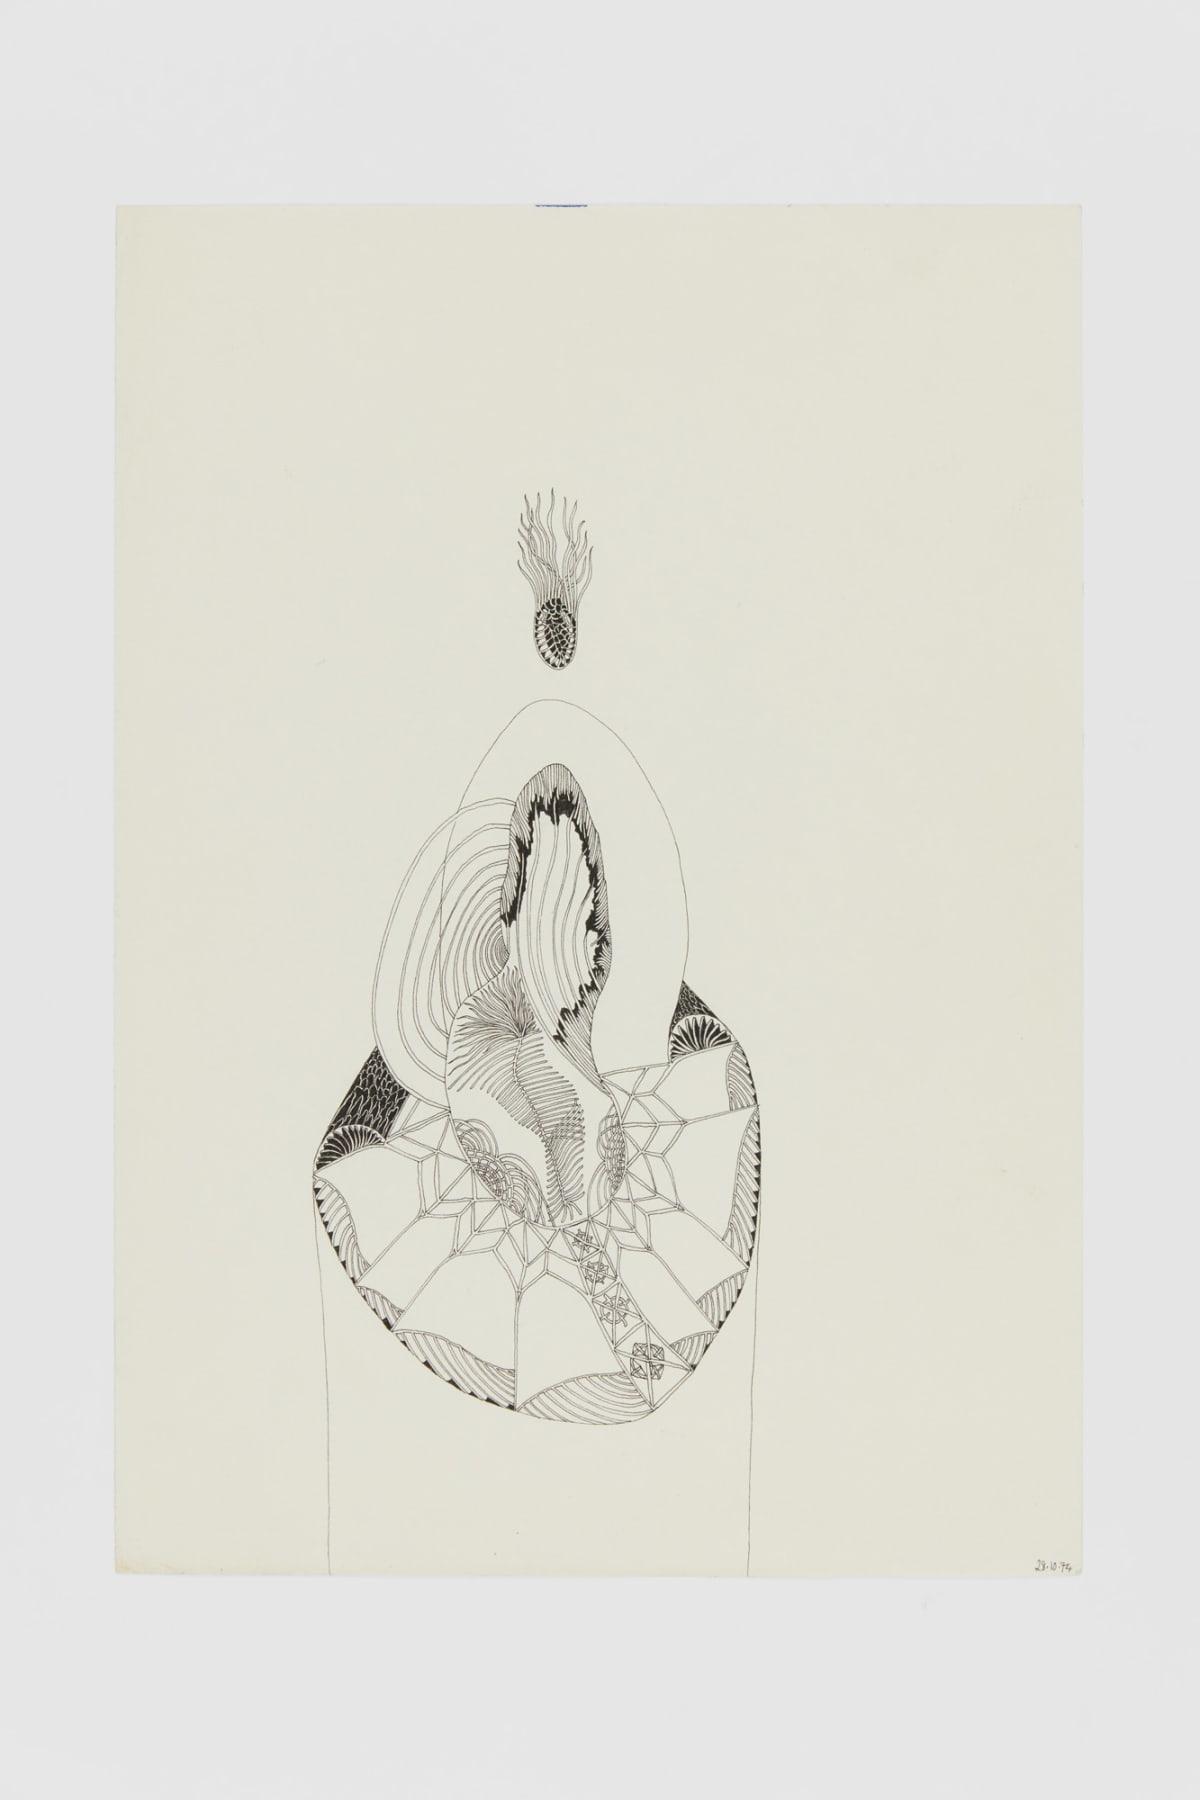 Ann CHURCHILL 28.10.74 (Daily drawings), 1974 Pen on paper 29.7 x 20.9 cm